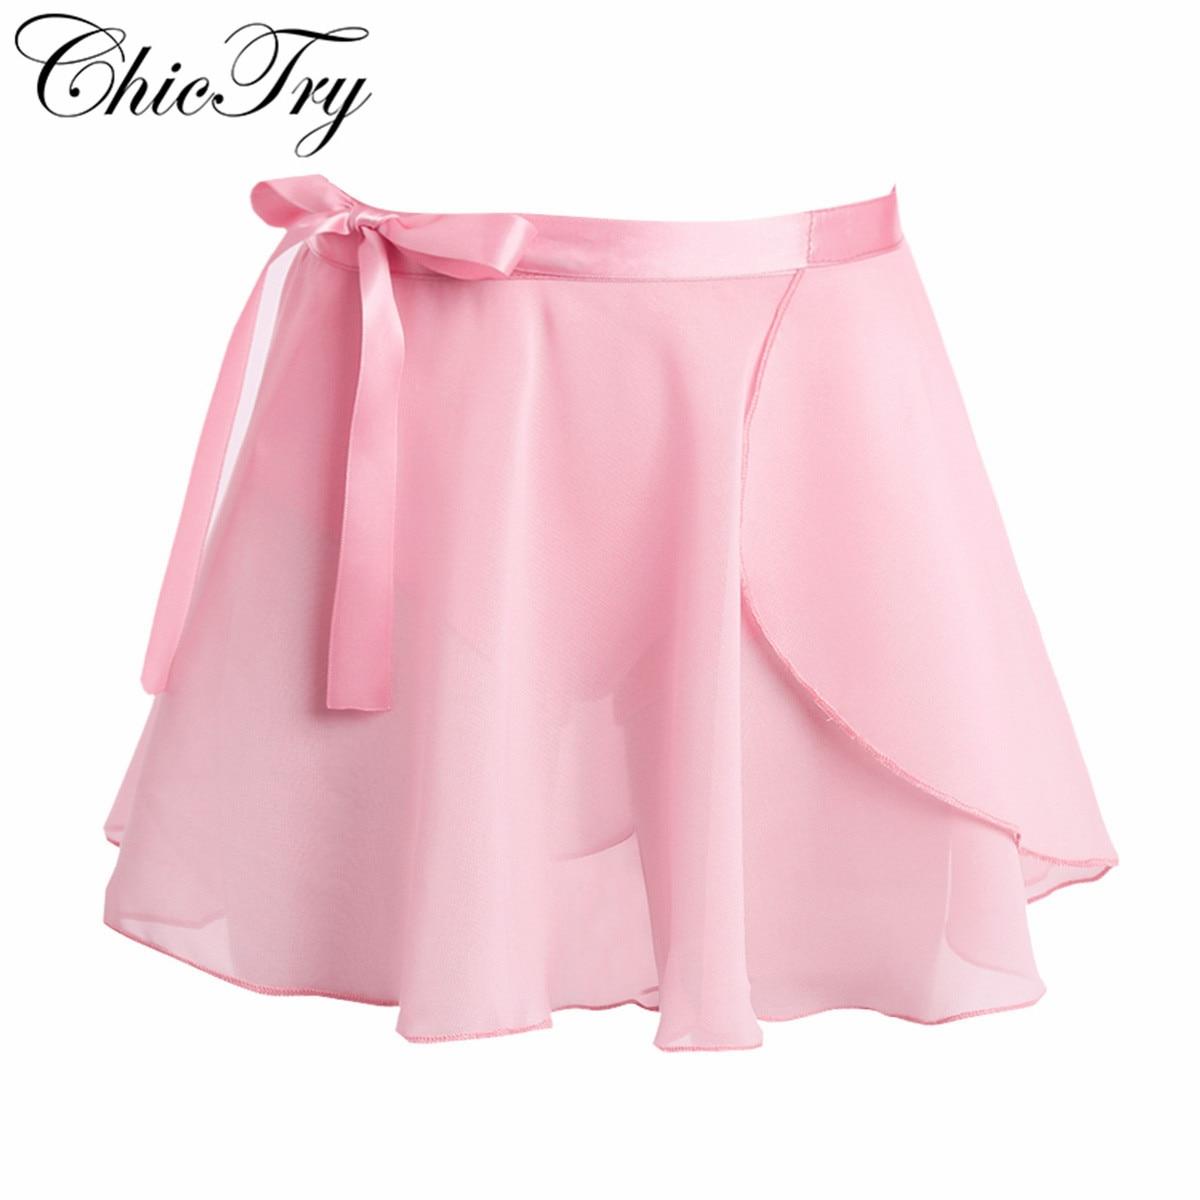 kids-girls-children-font-b-ballet-b-font-dance-stage-performance-skirt-basic-classic-chiffon-mini-pull-on-wrap-skirt-with-waist-tie-for-dance